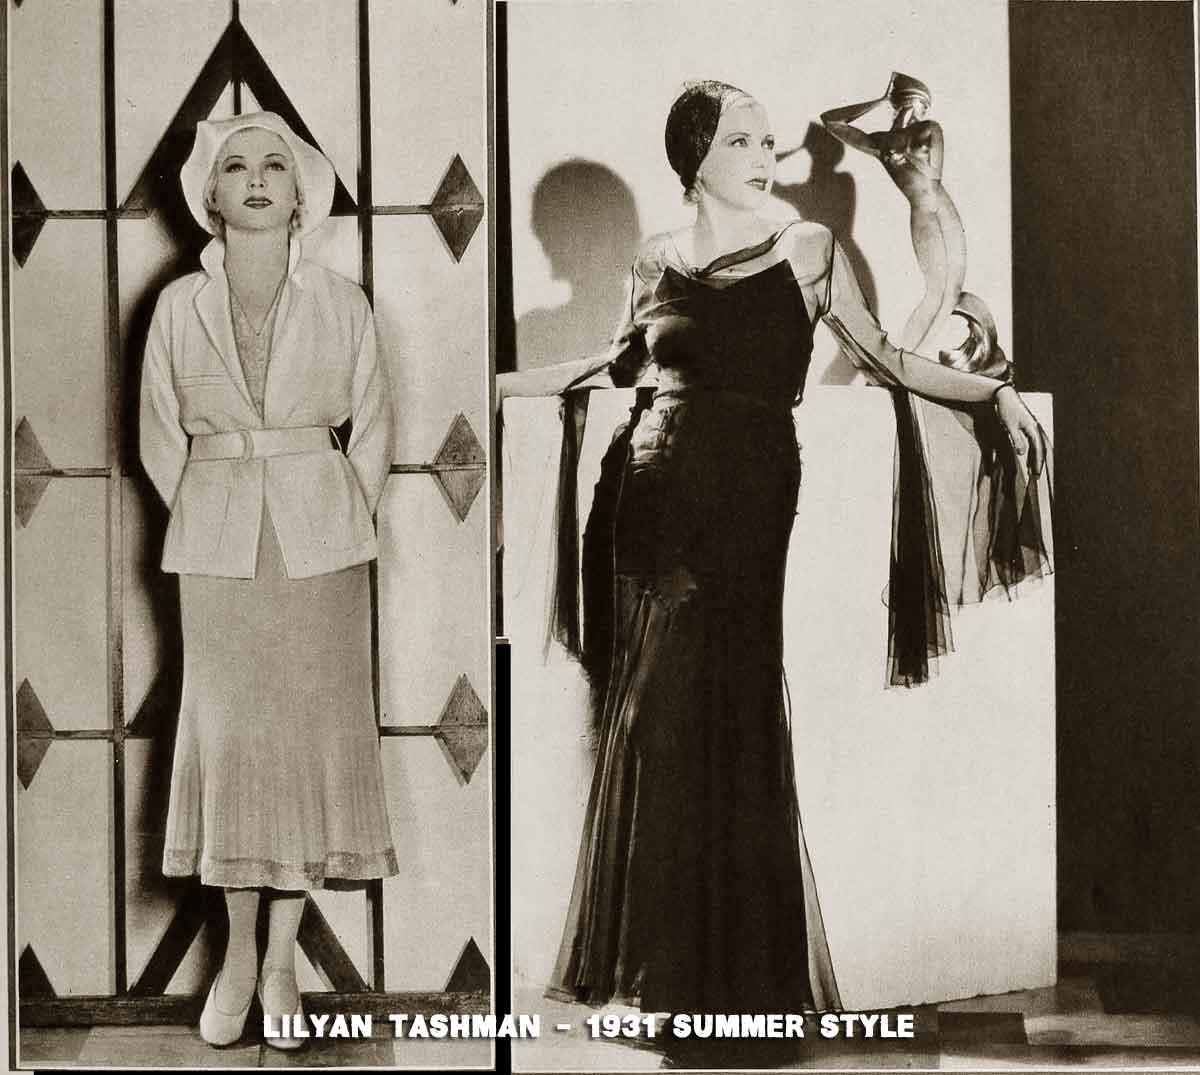 Two summer frocks worn by -Lilyan-Tashman-1931